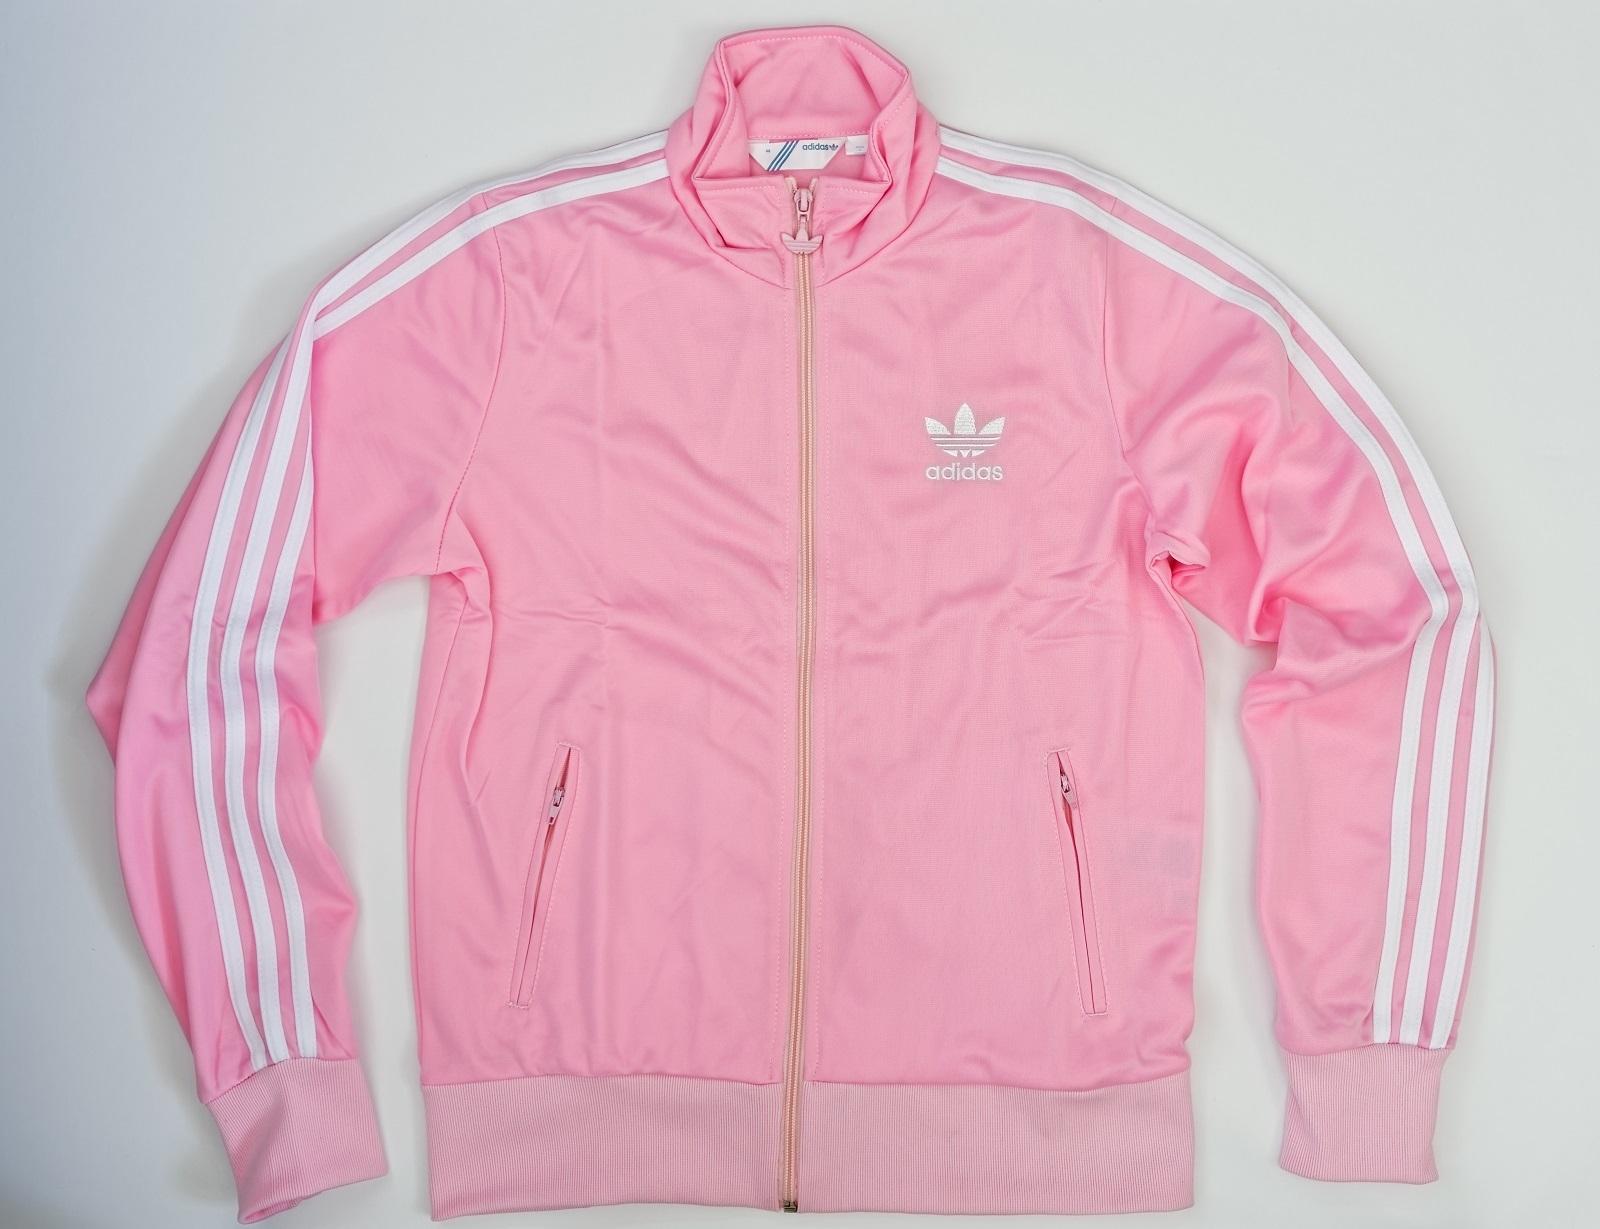 Similar Originals 50 Items Adidas Pink Firebird And Women FKJlcT1